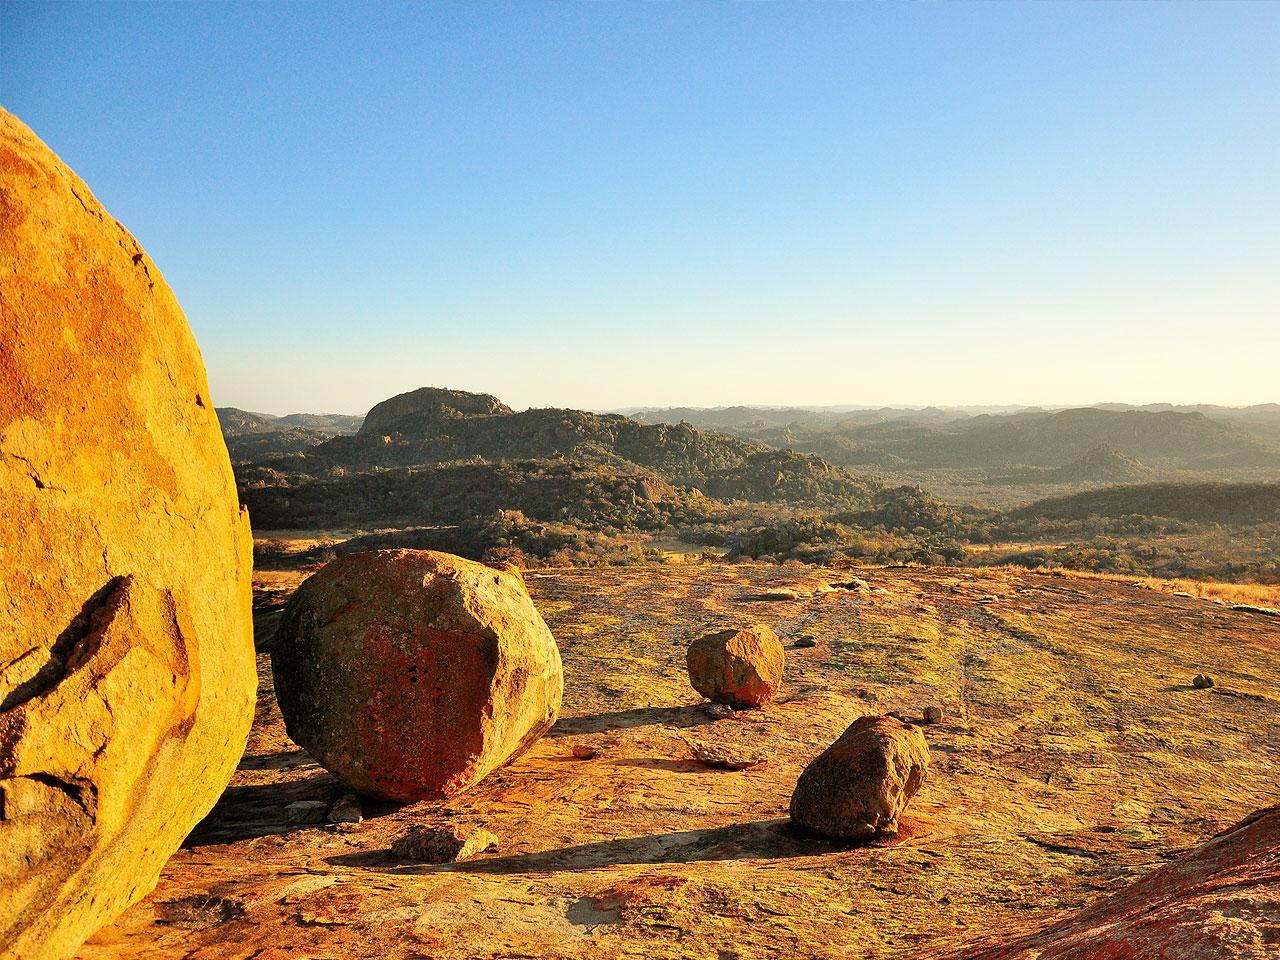 A view of Zimbabwe's landscape through boulders.